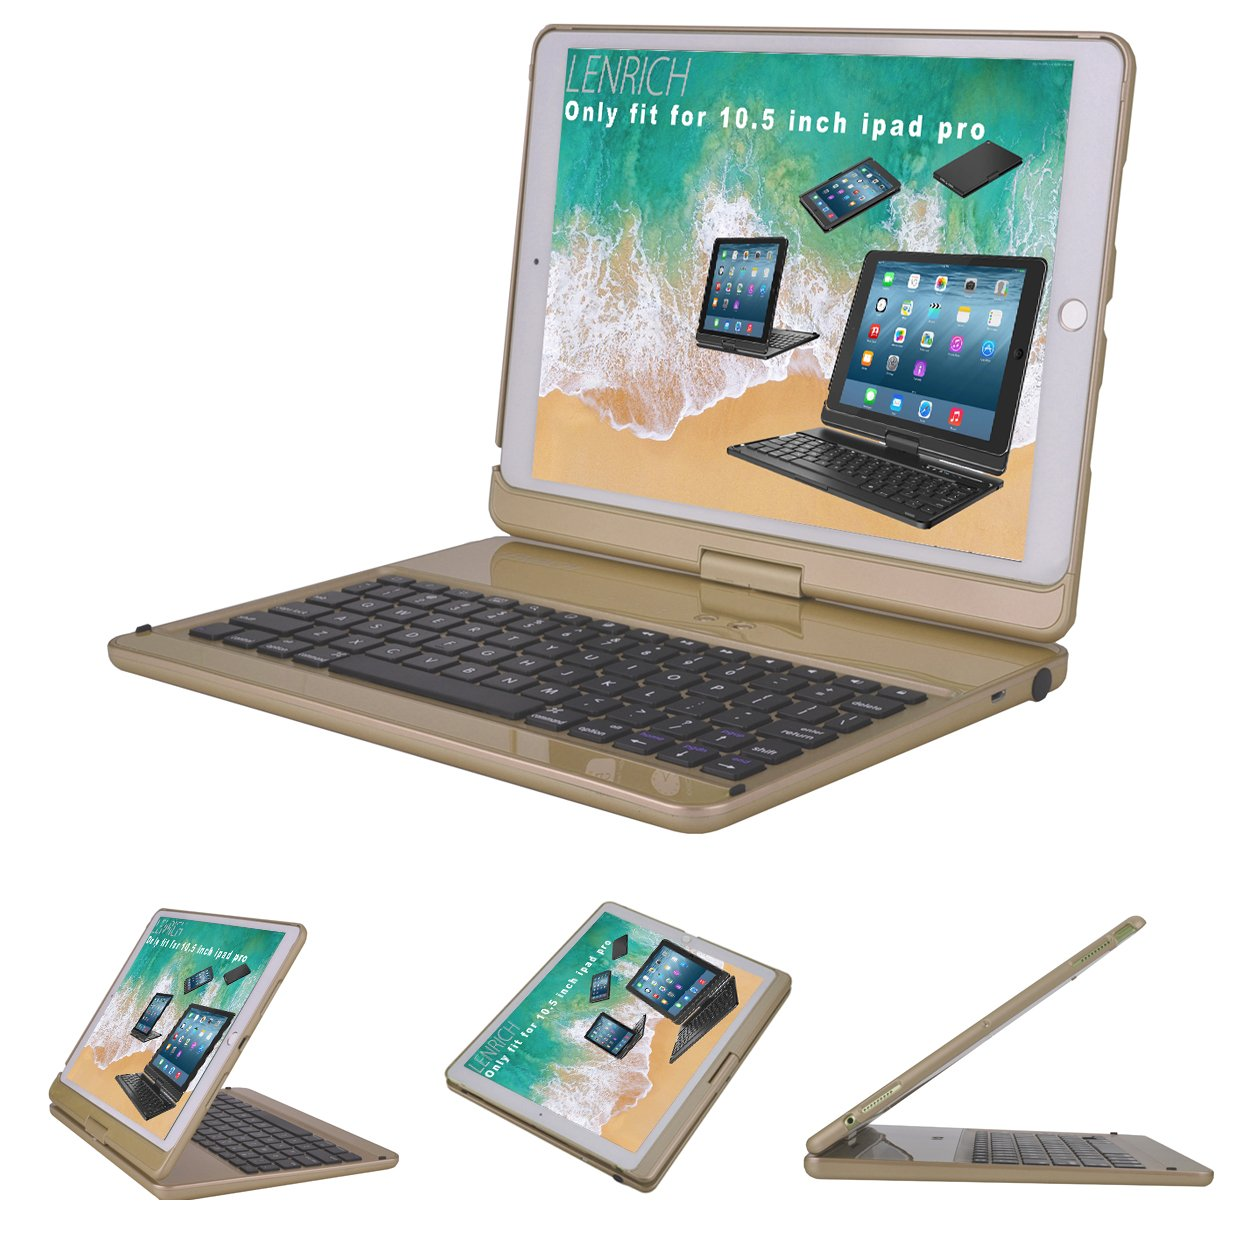 LENRICH 2017 iPad Pro 10.5 iPad Air 3rd 2019 case with Keyboard,360 rotatable Wireless 180 Flip Smart Folio Cover Hard Shell Swivel Stand Auto Sleep/Wake up ...